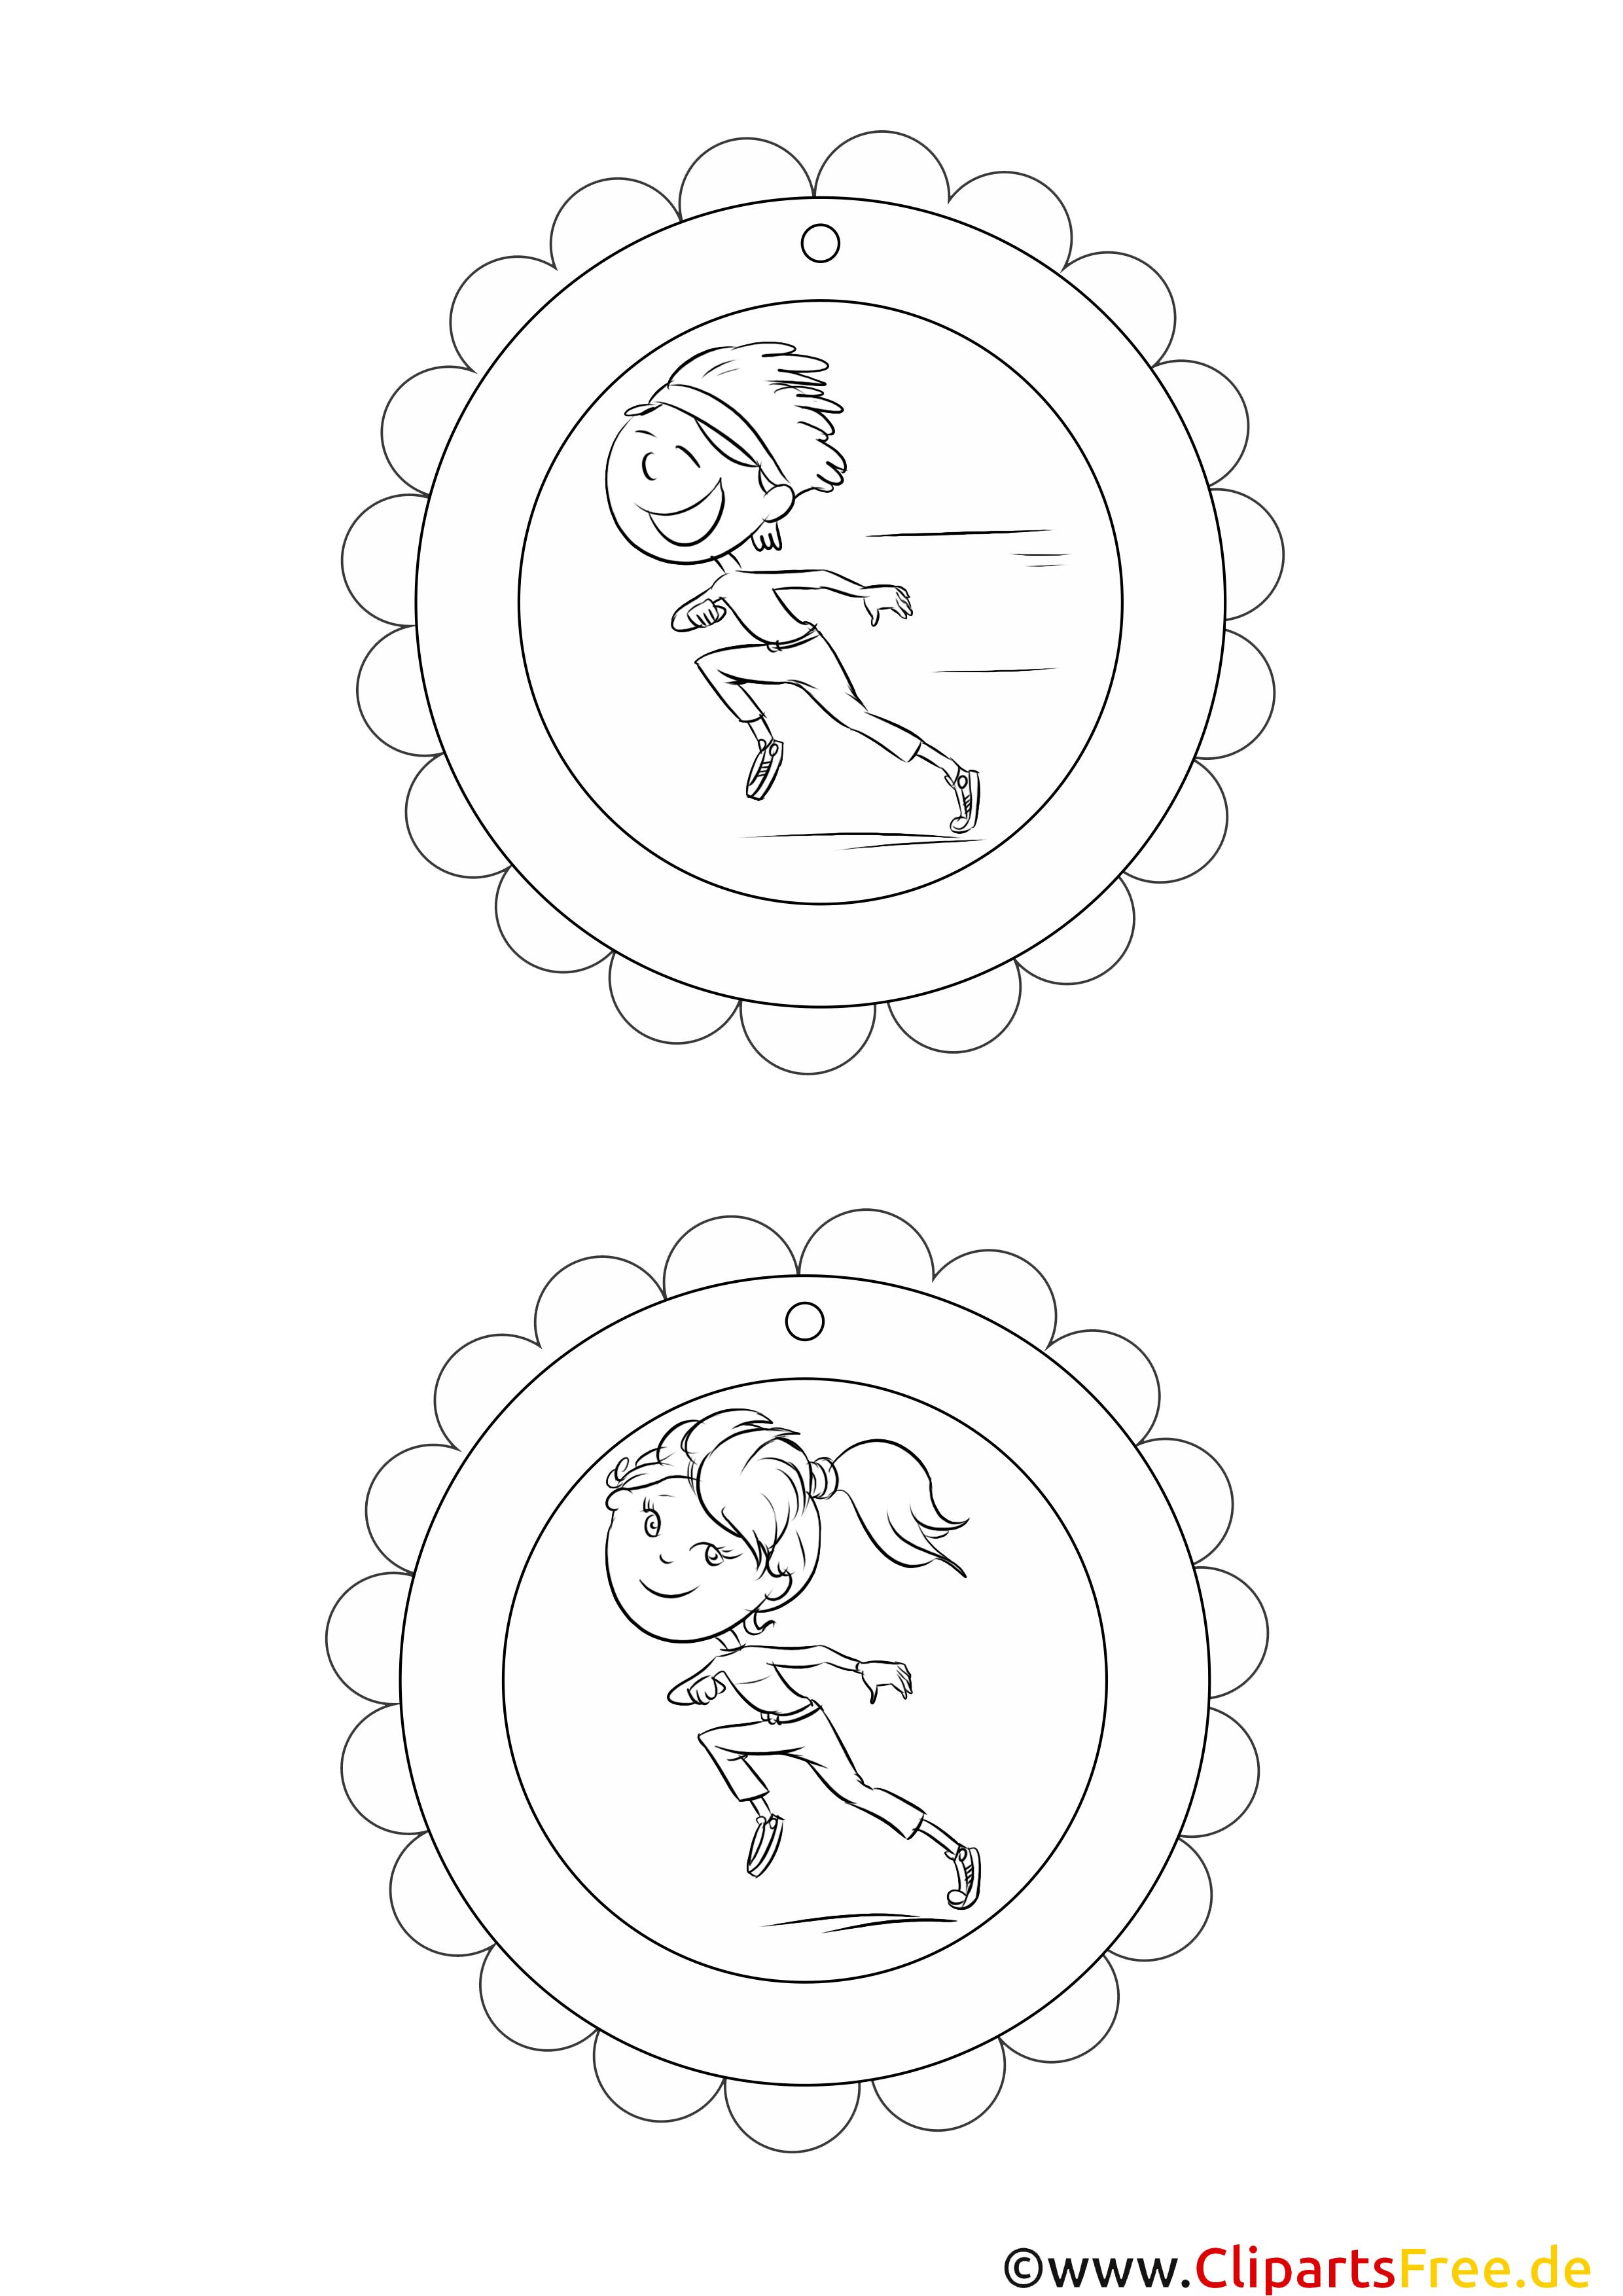 sportmedaillen medaillen selbst basteln vorlagen. Black Bedroom Furniture Sets. Home Design Ideas